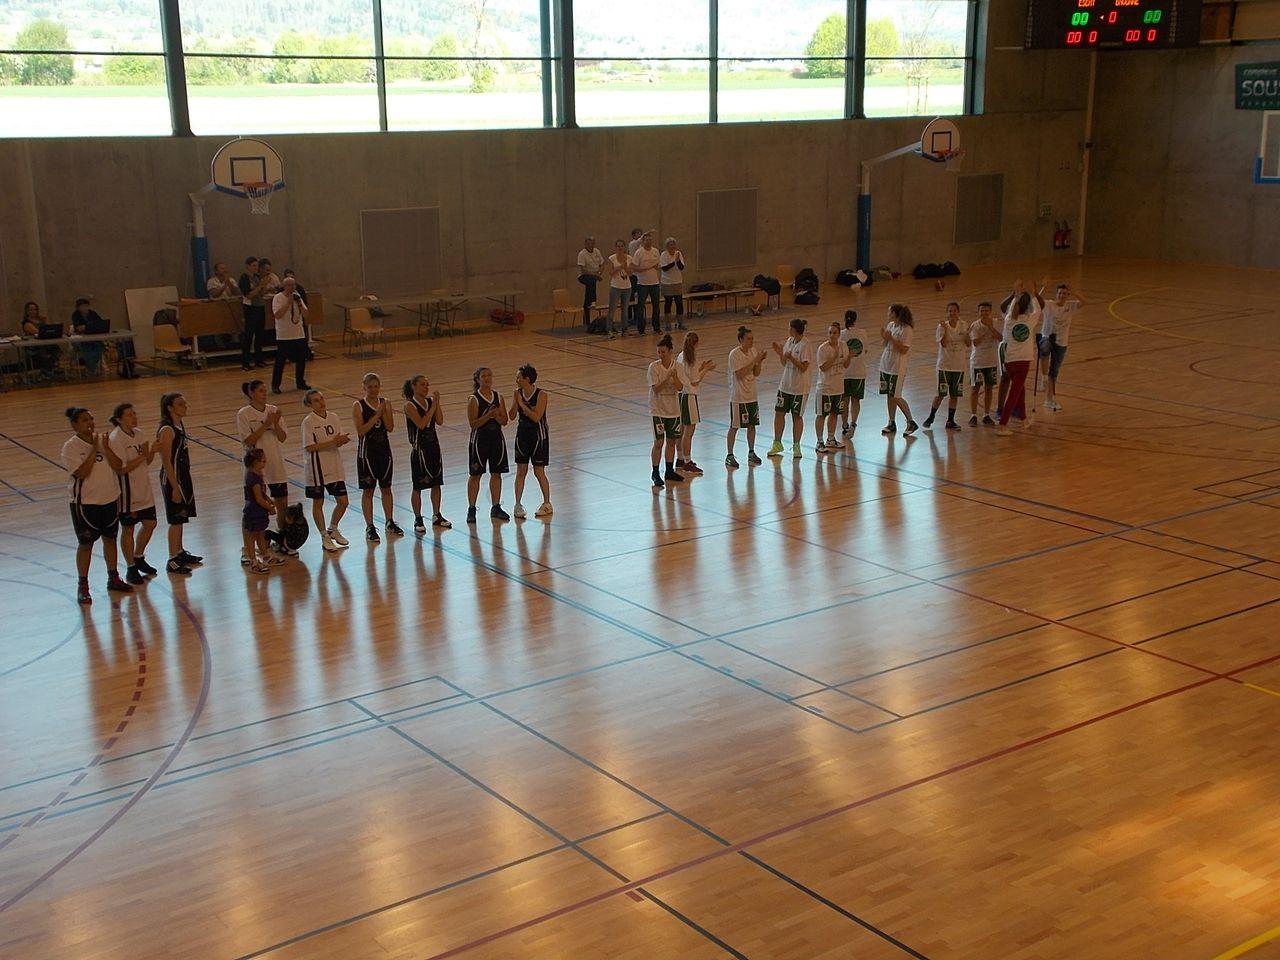 2014-04-13_sf1-contre-bavonne-1598